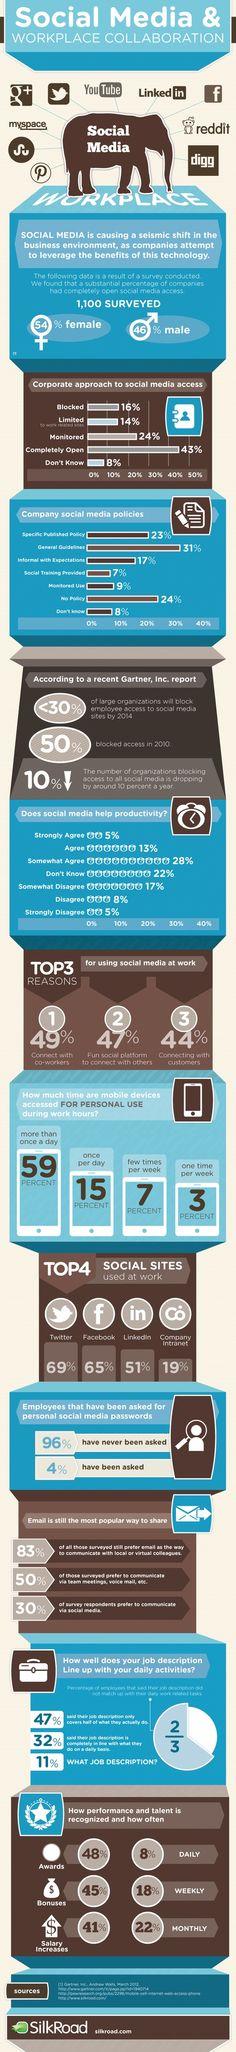 Social Media & Workspace Collaboration